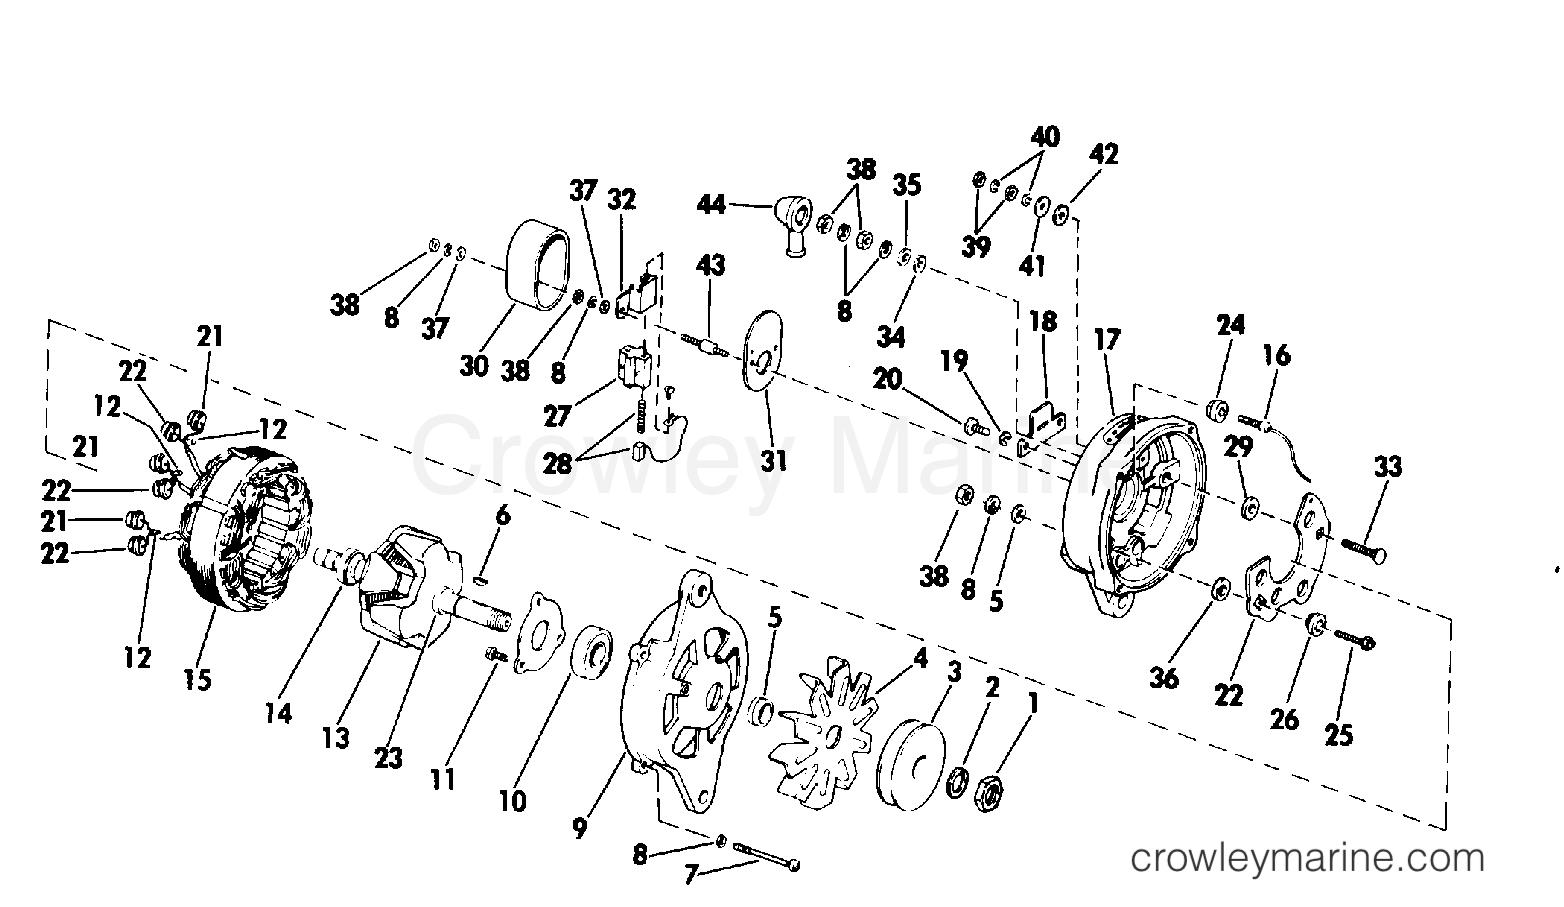 Alternator Group Prestolite Alk 6222ay 1980 Omc Stern Drive 3 Marine Wiring Diagram 990334c Section